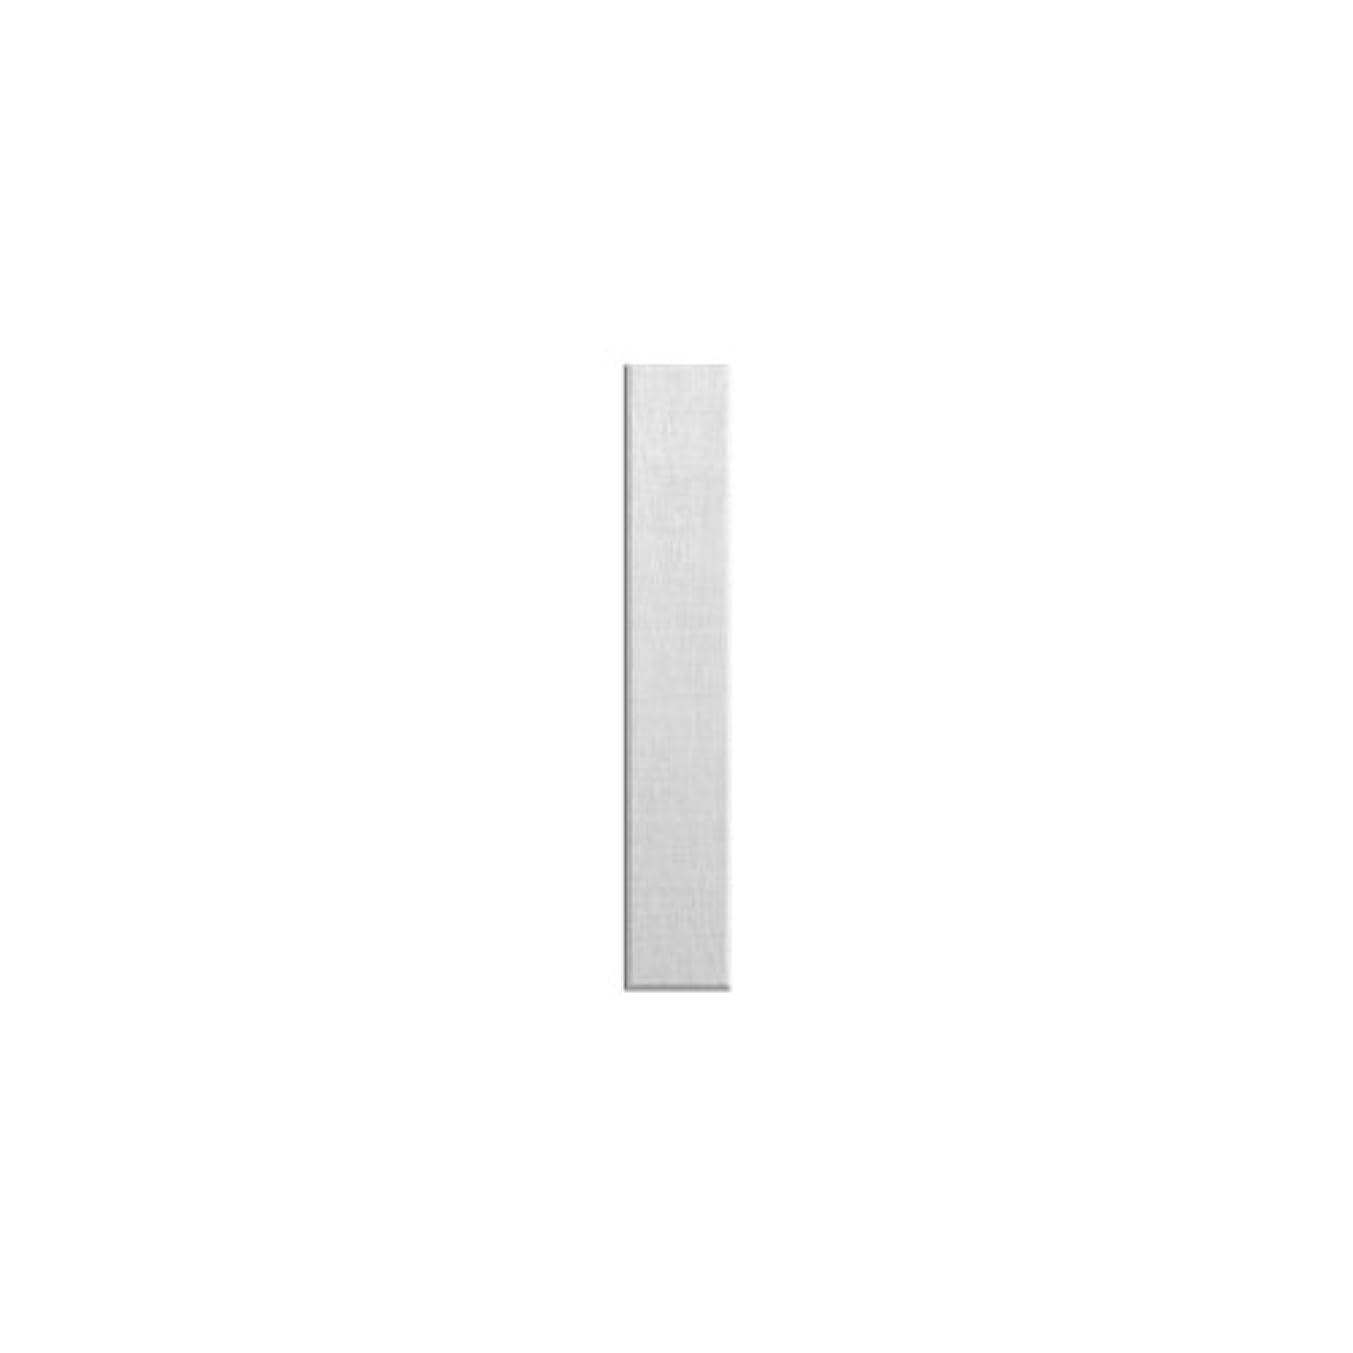 ImpressArt, Strip, Stamping Blanks, 1/4